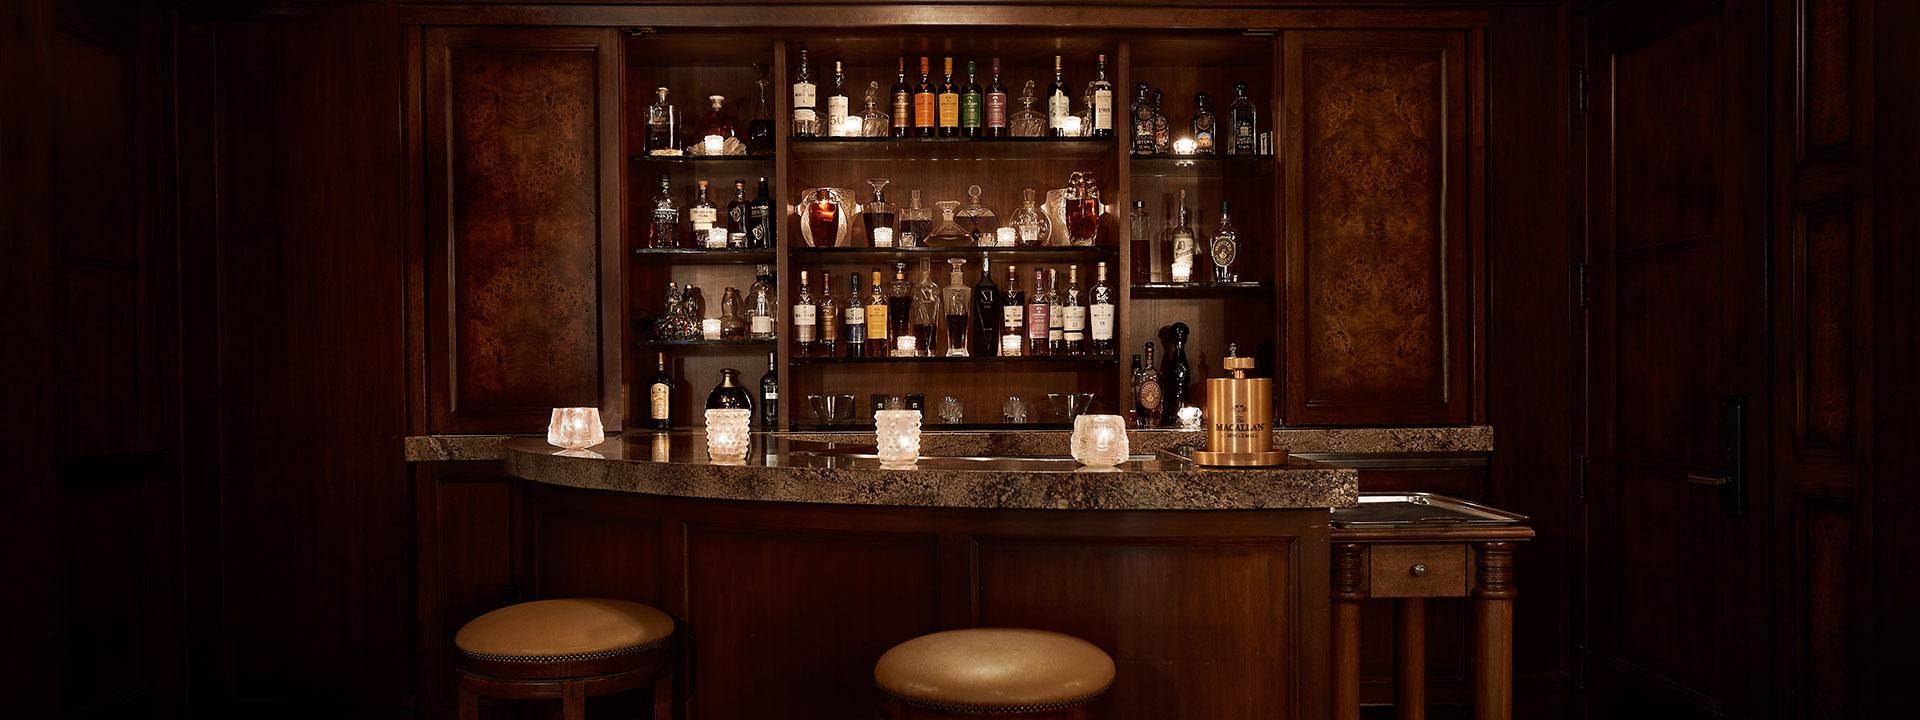 The Cigar Bar counter and spirits collection